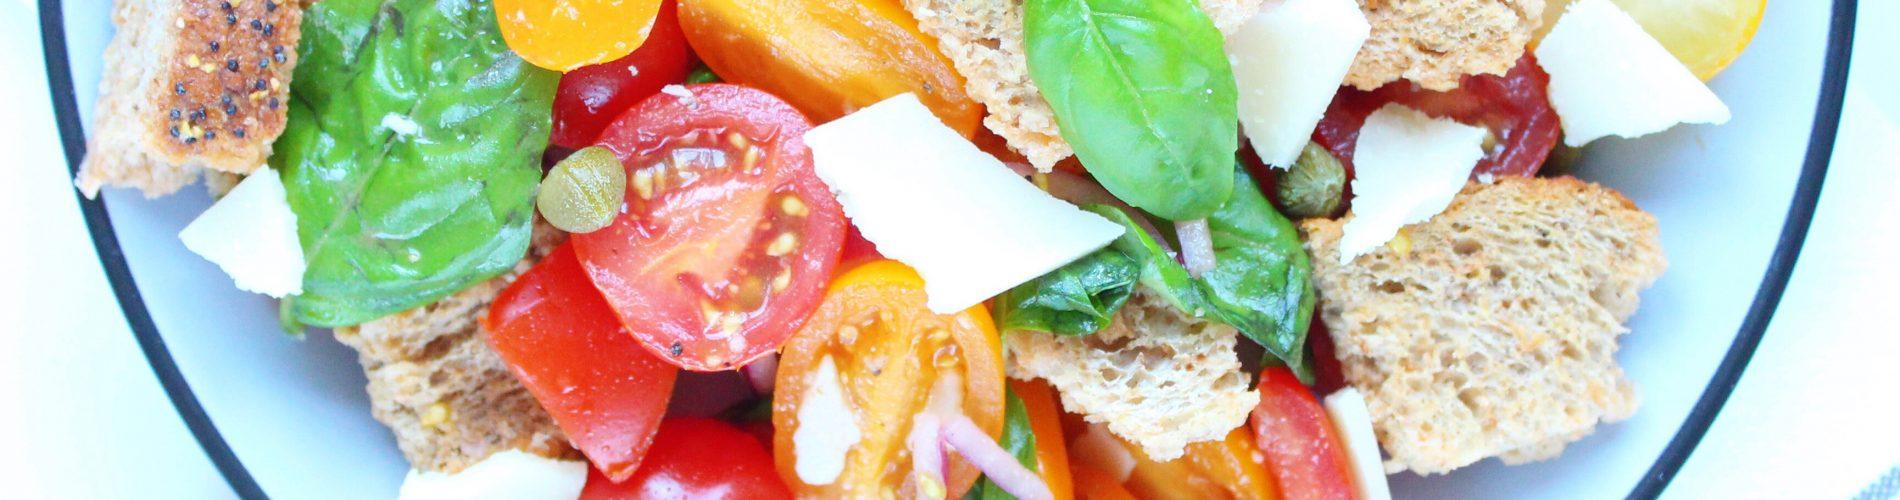 Salade   panzanella (Italiaanse broodsalade)